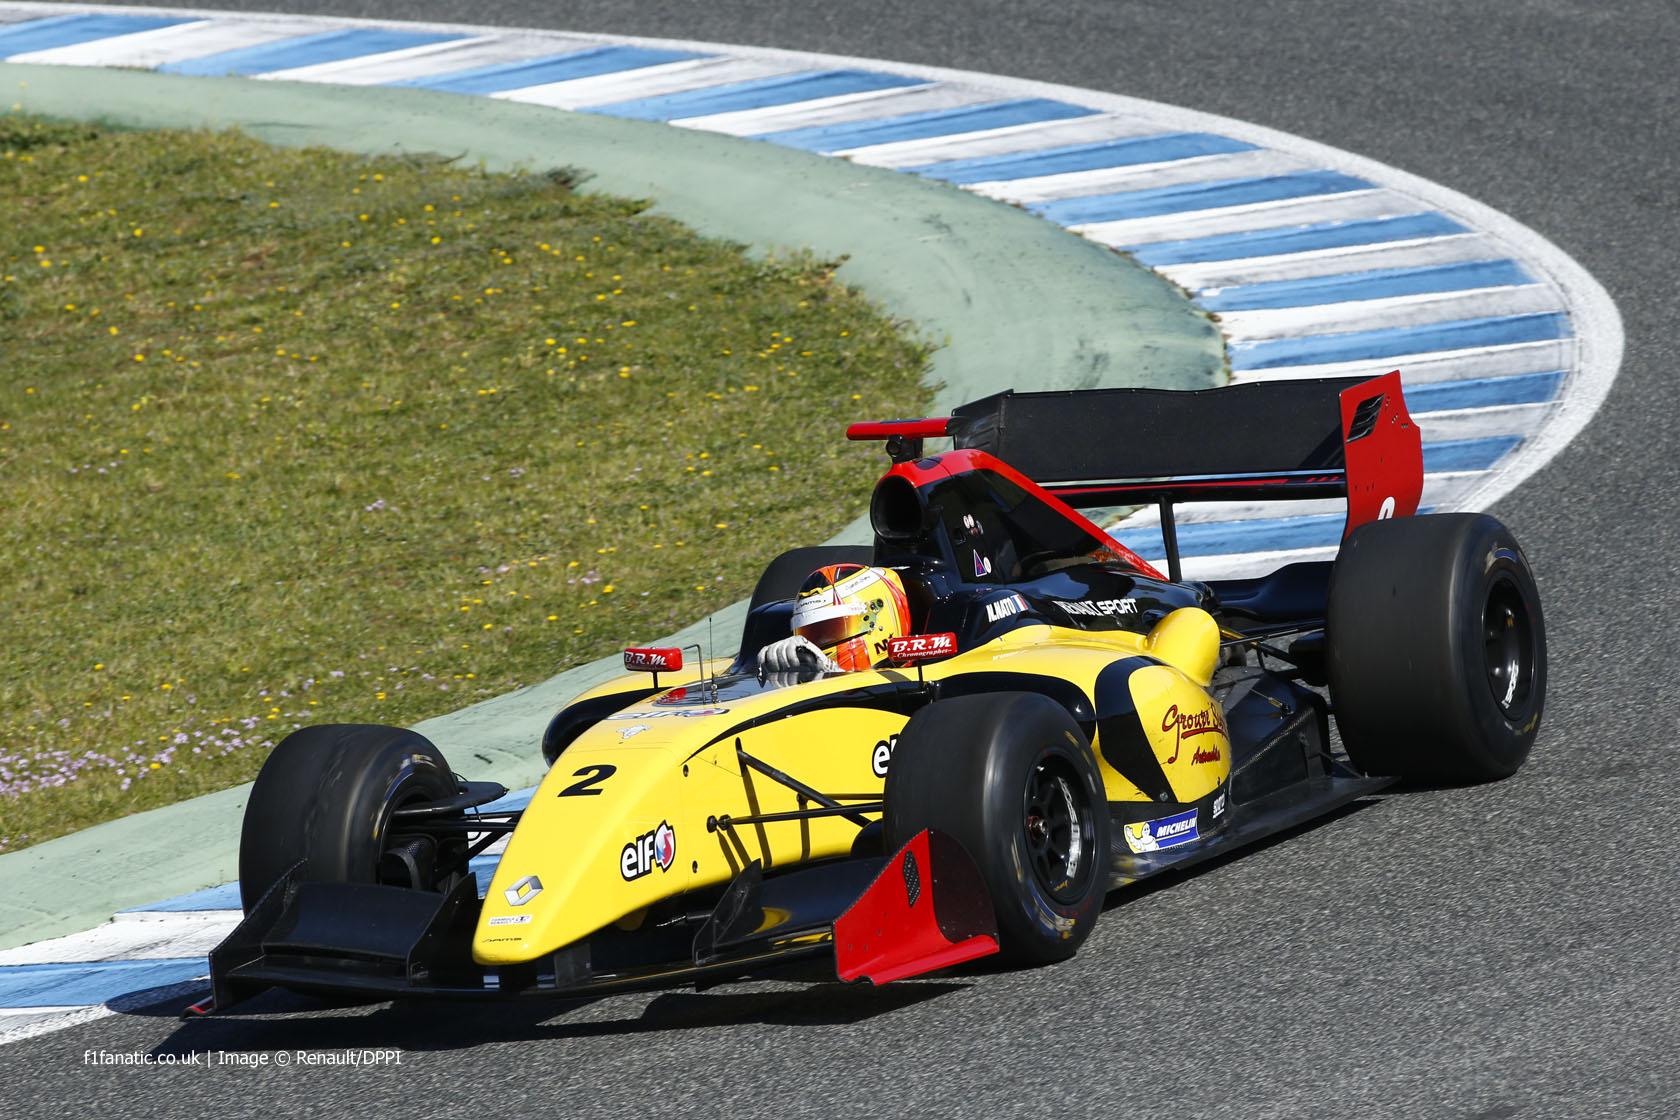 Norman Nato, DAMS, Jerez, 2014